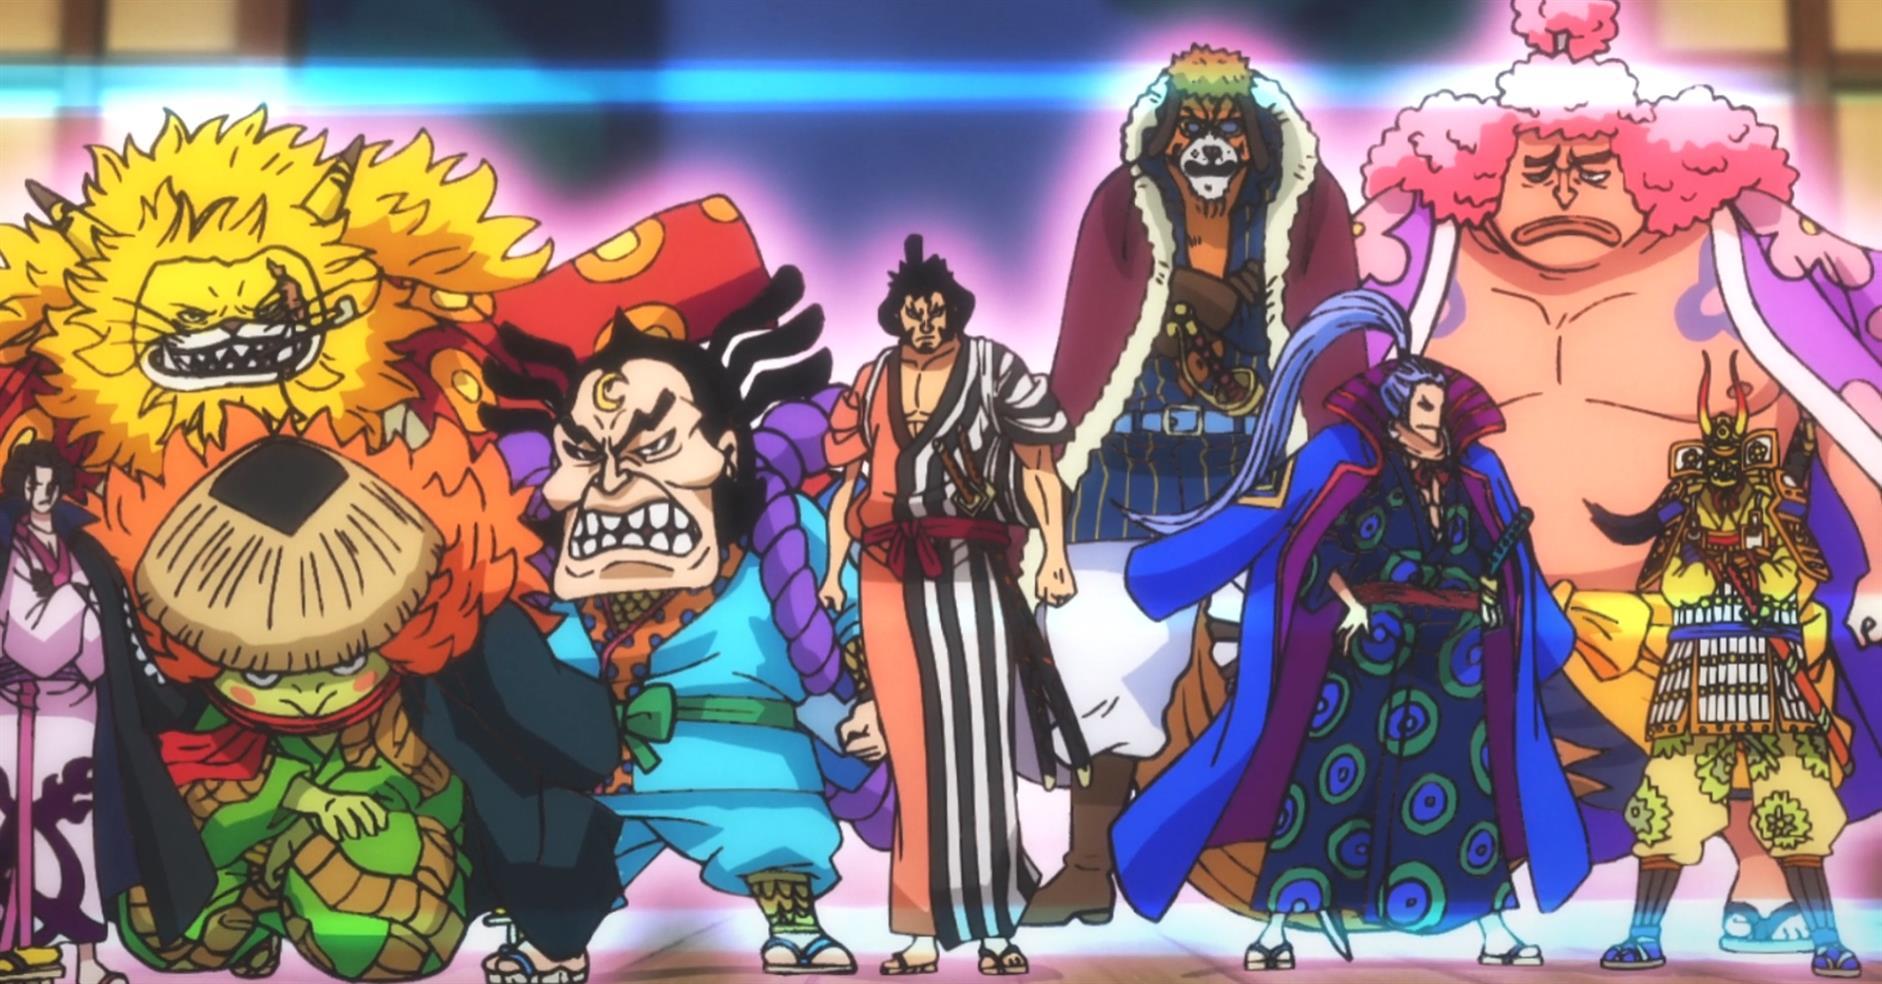 One Piece Episodio 996 Spoiler riassunto data di uscita e tempo sCki9O 2 4